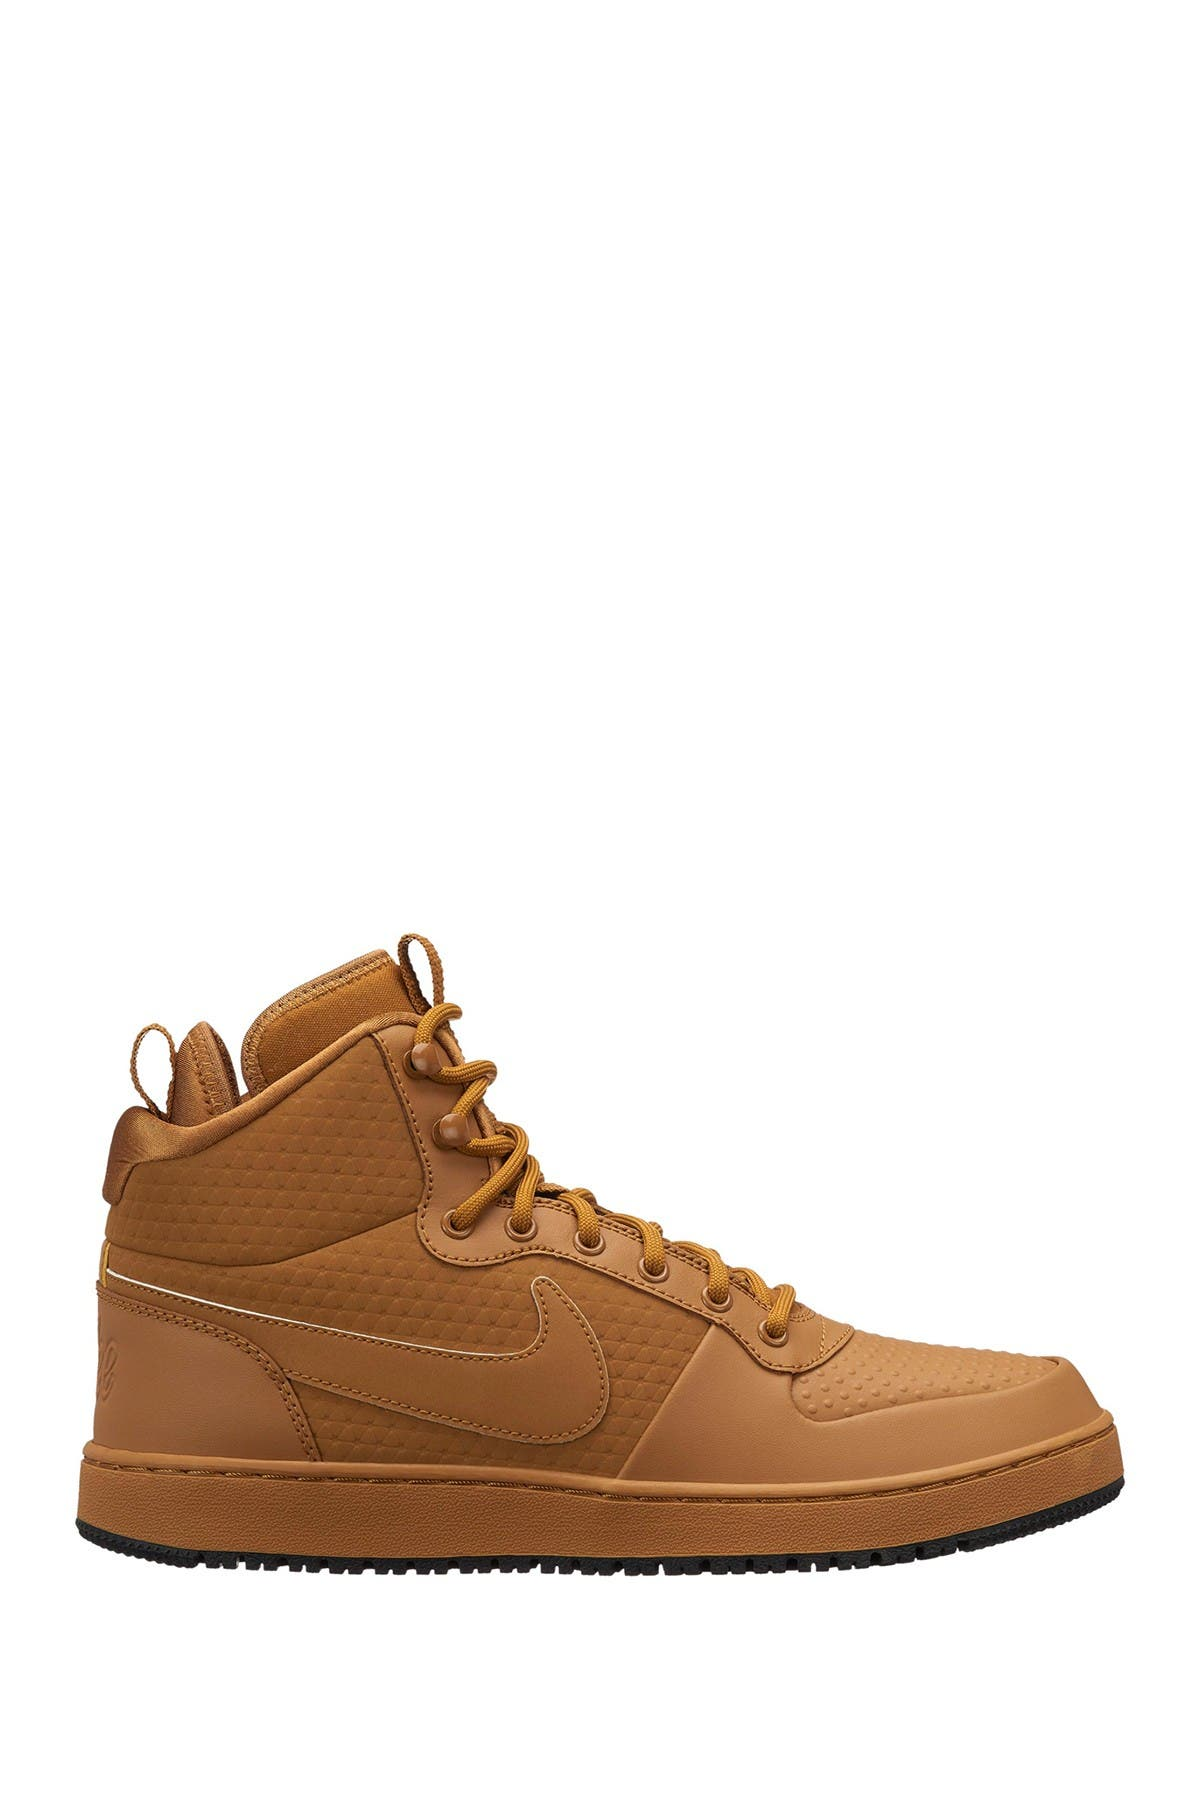 nike men's ebernon winter mid top sneaker